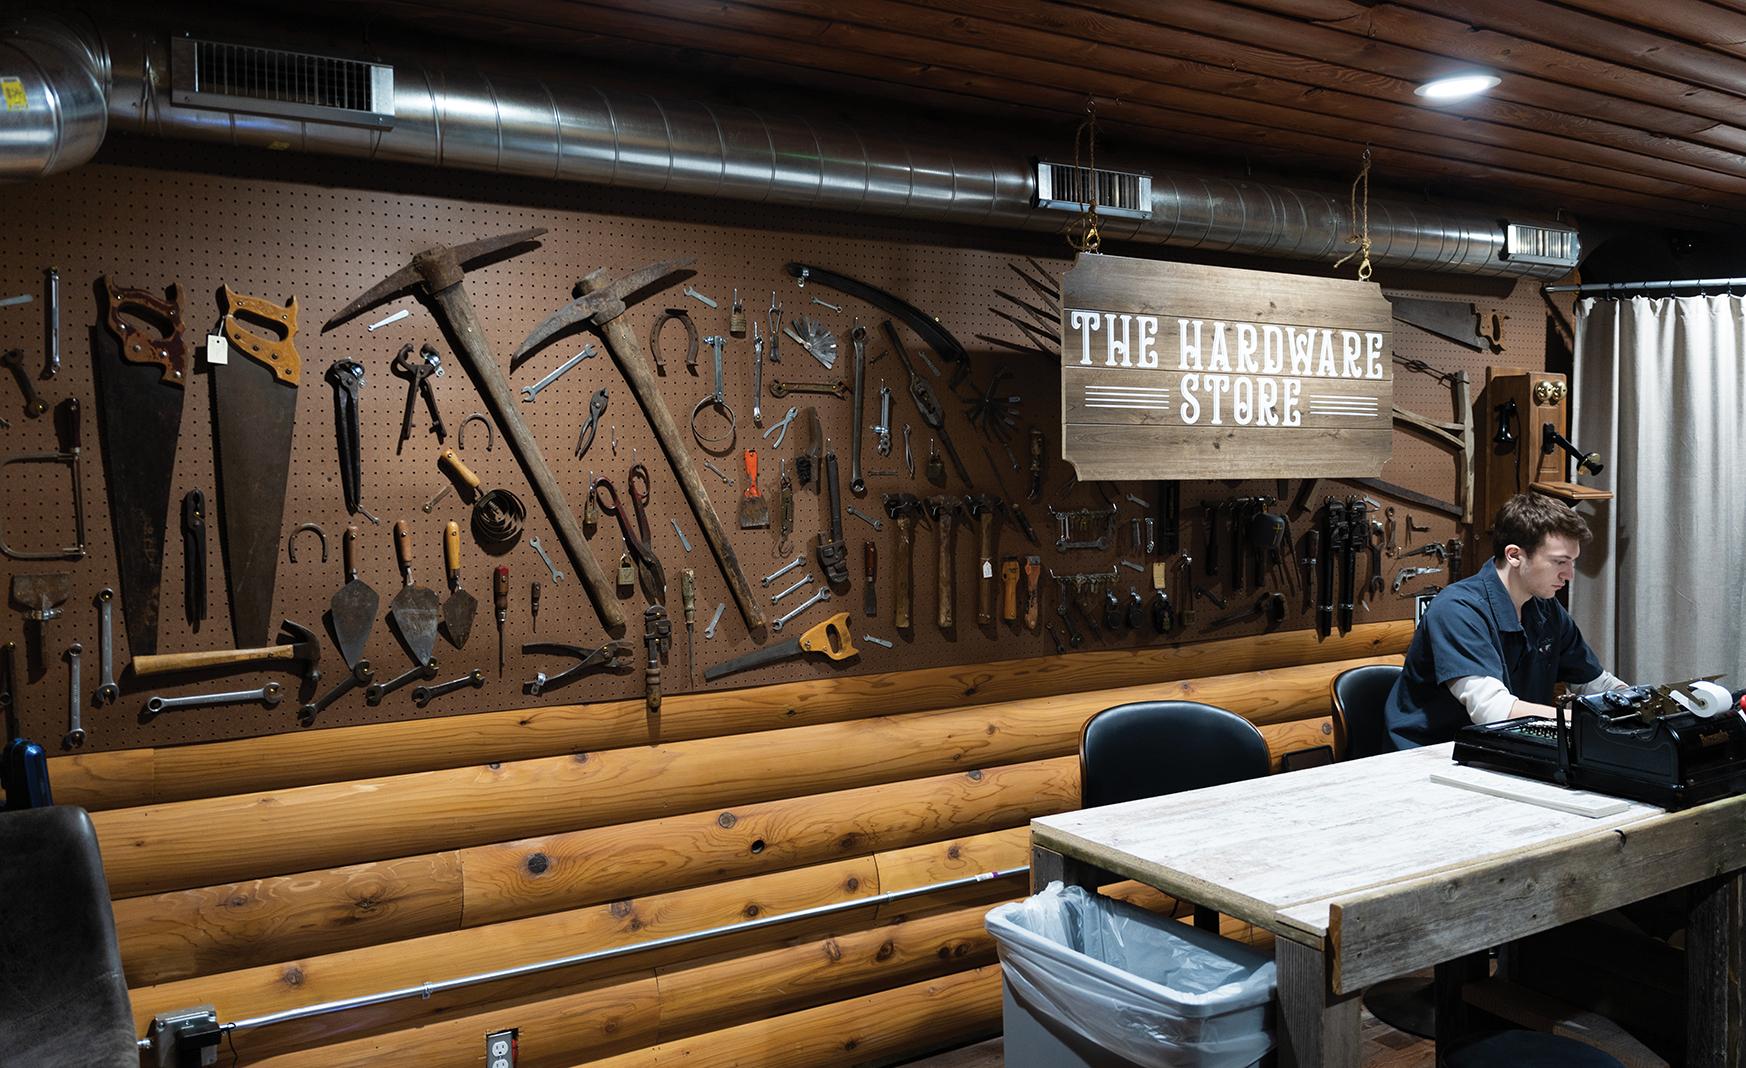 The Hardware Store's speakeasy paraphernalia